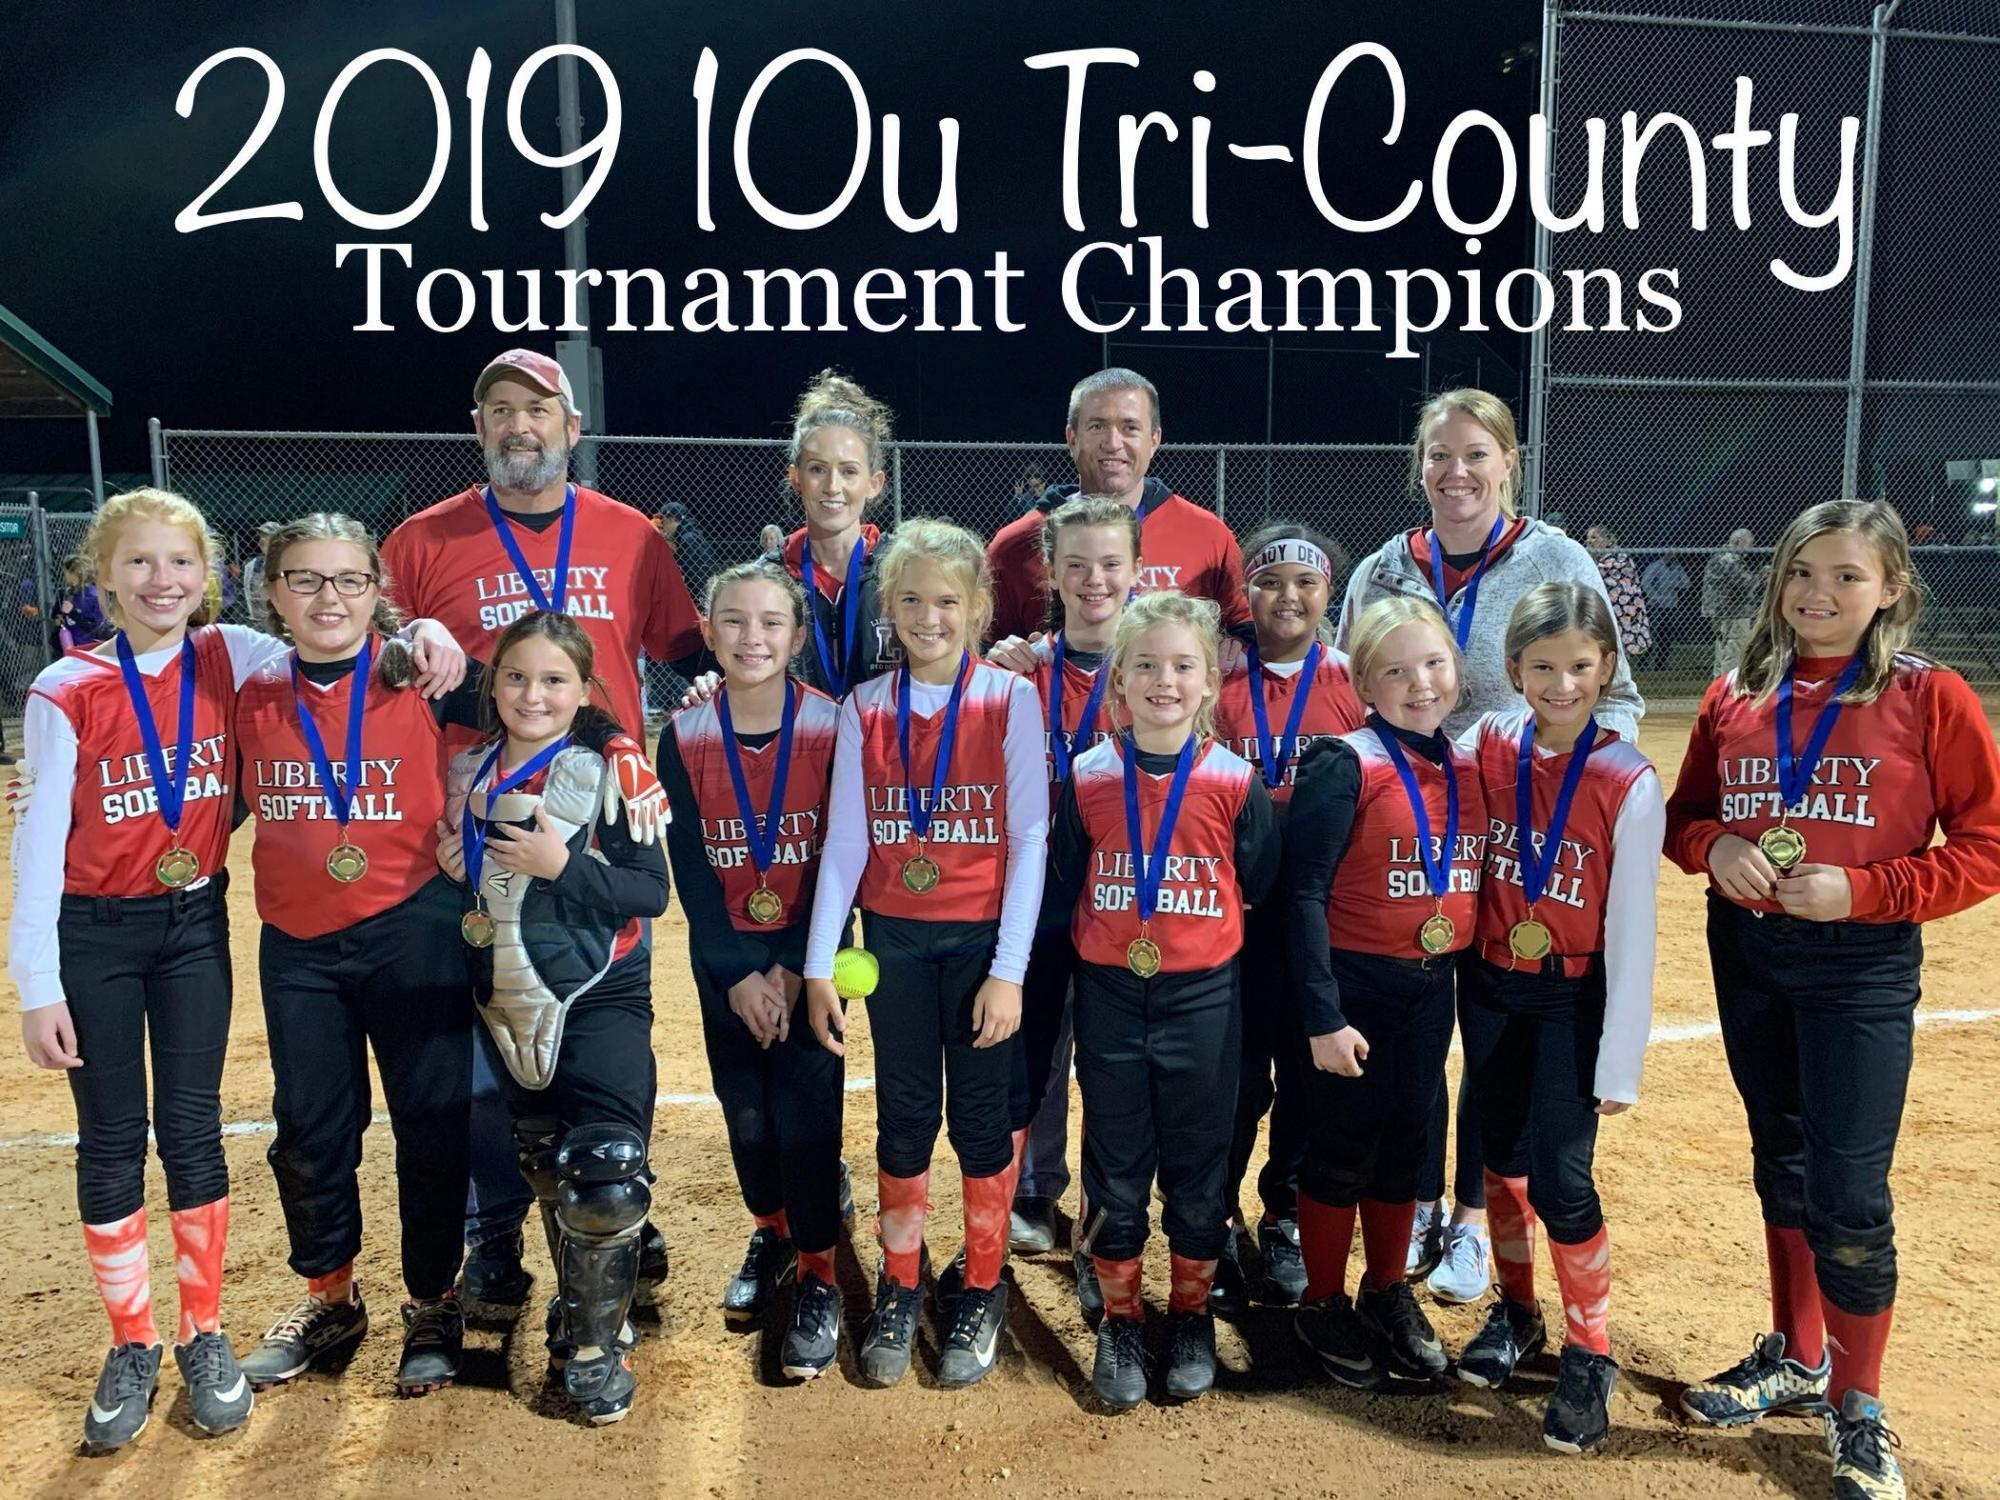 10u Tri County Champion 2019